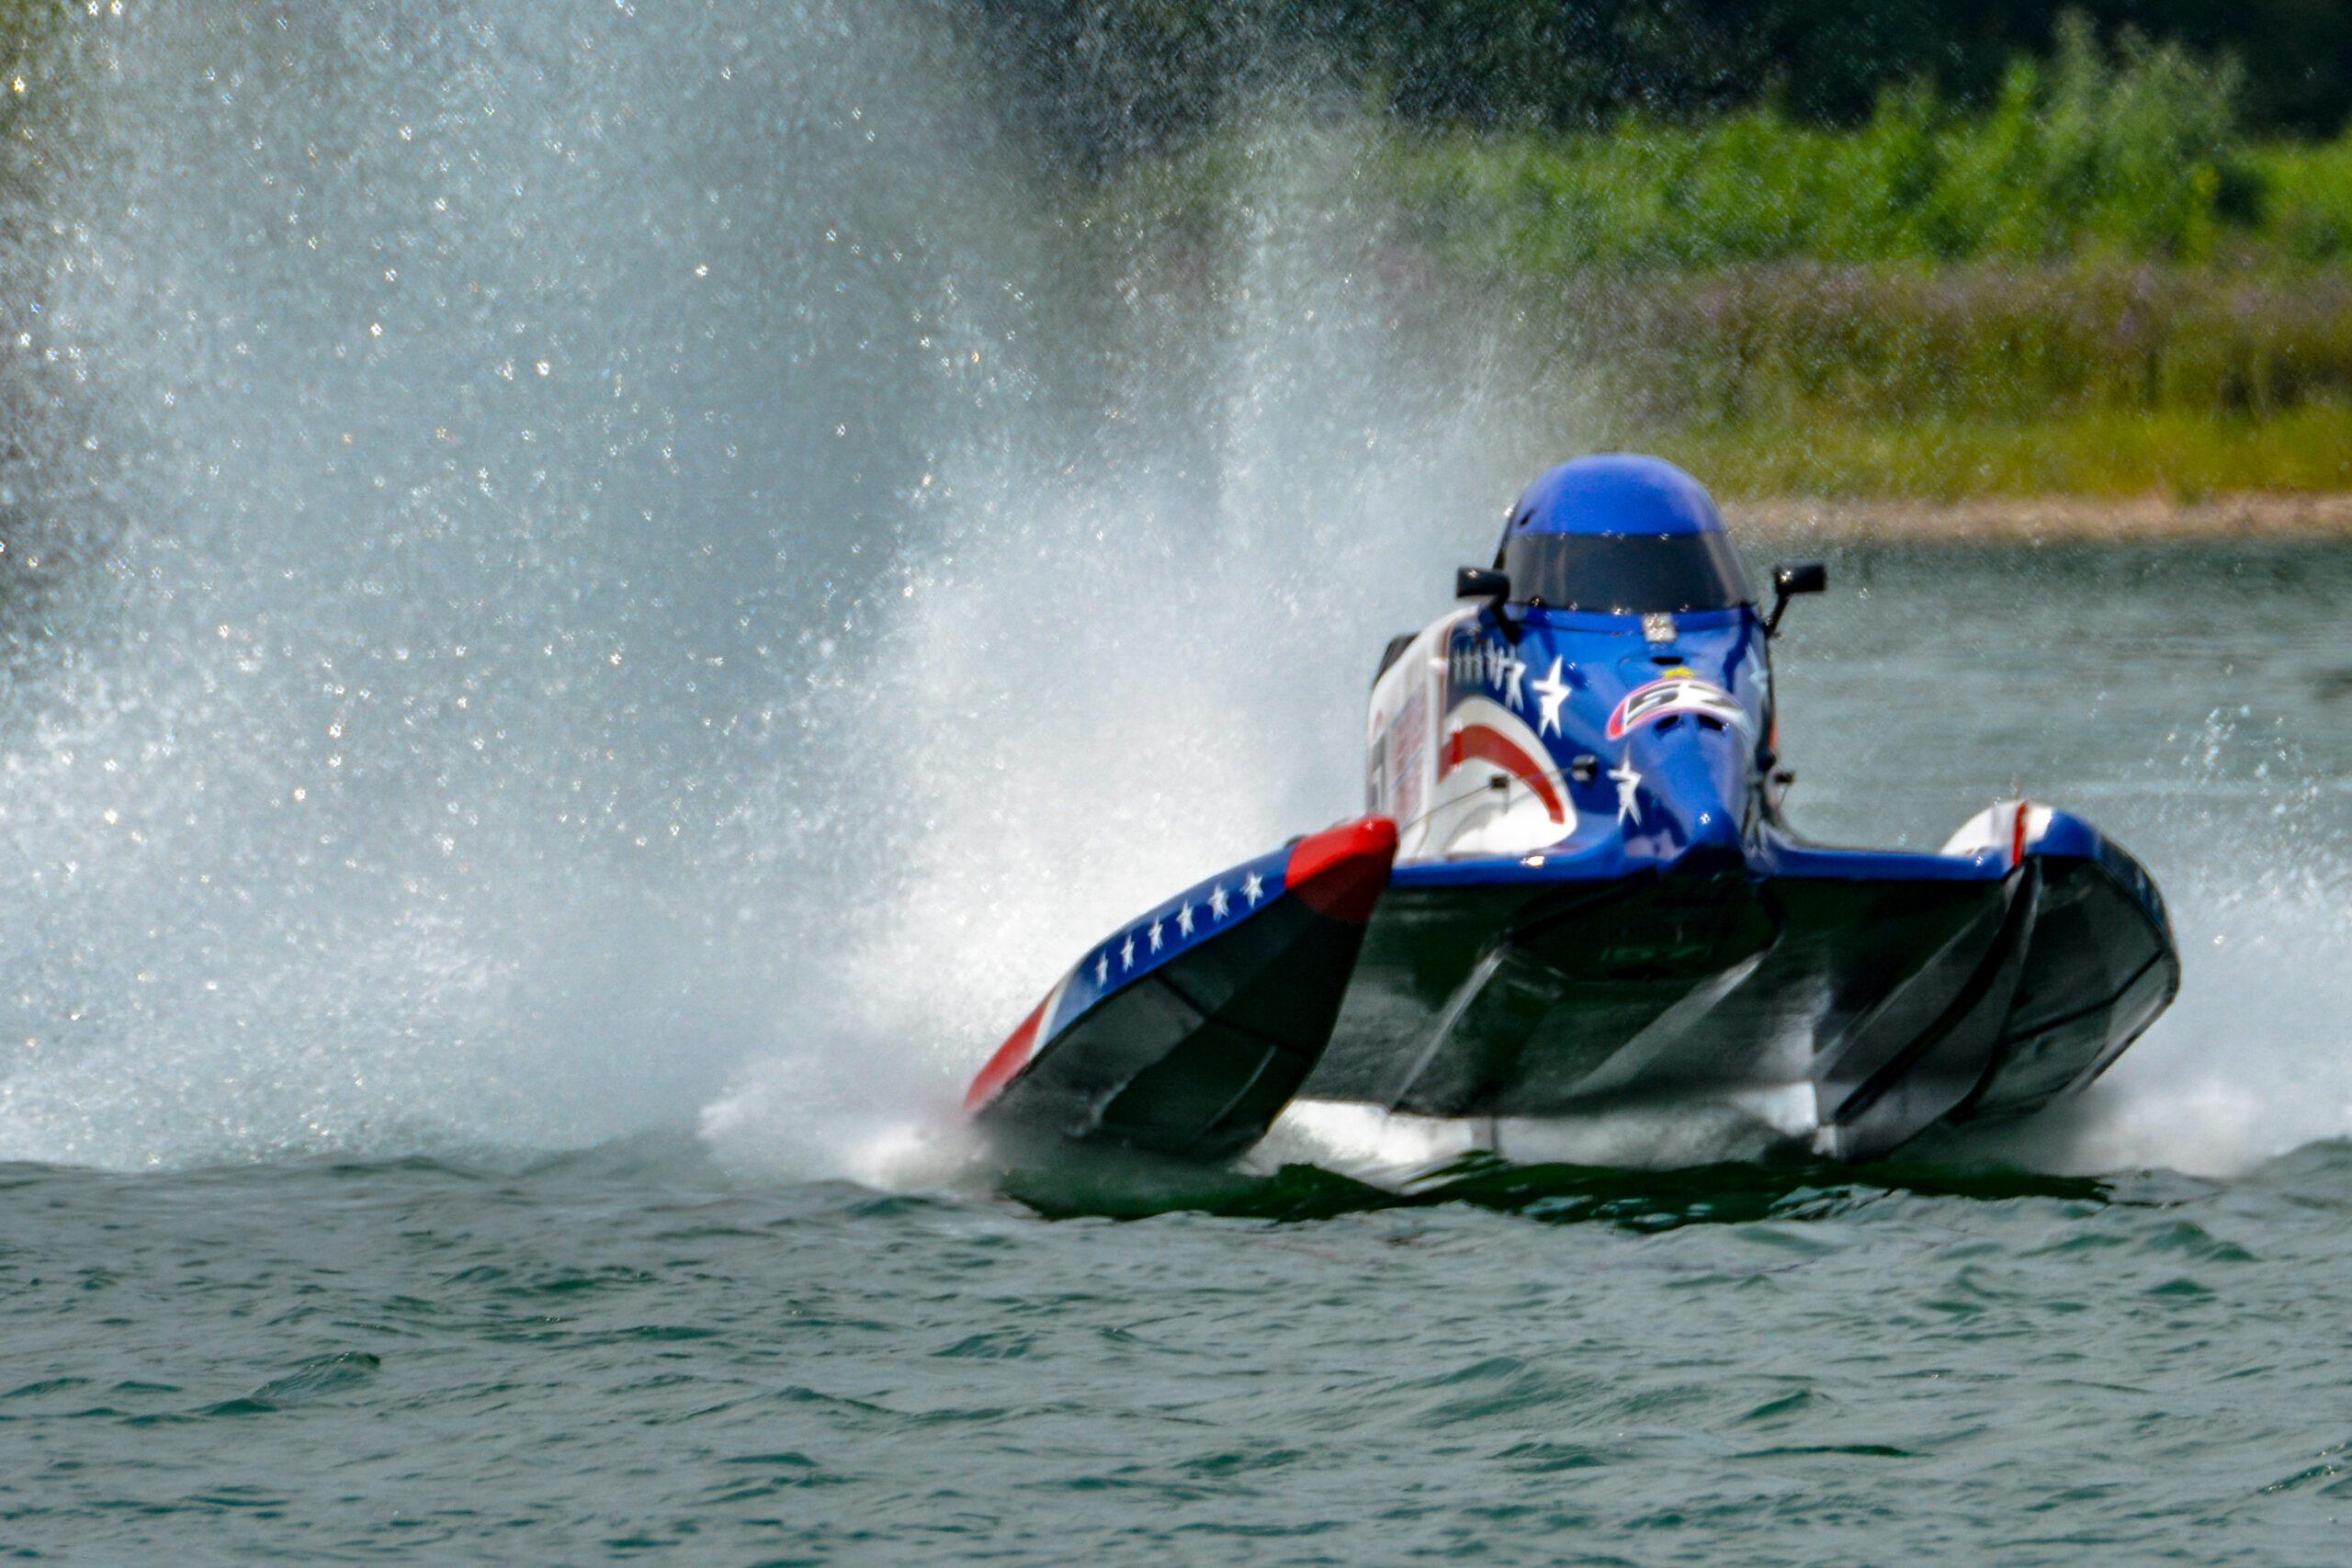 McMurray Racing Nashville Marine 2021 Springfield F1 Race-14